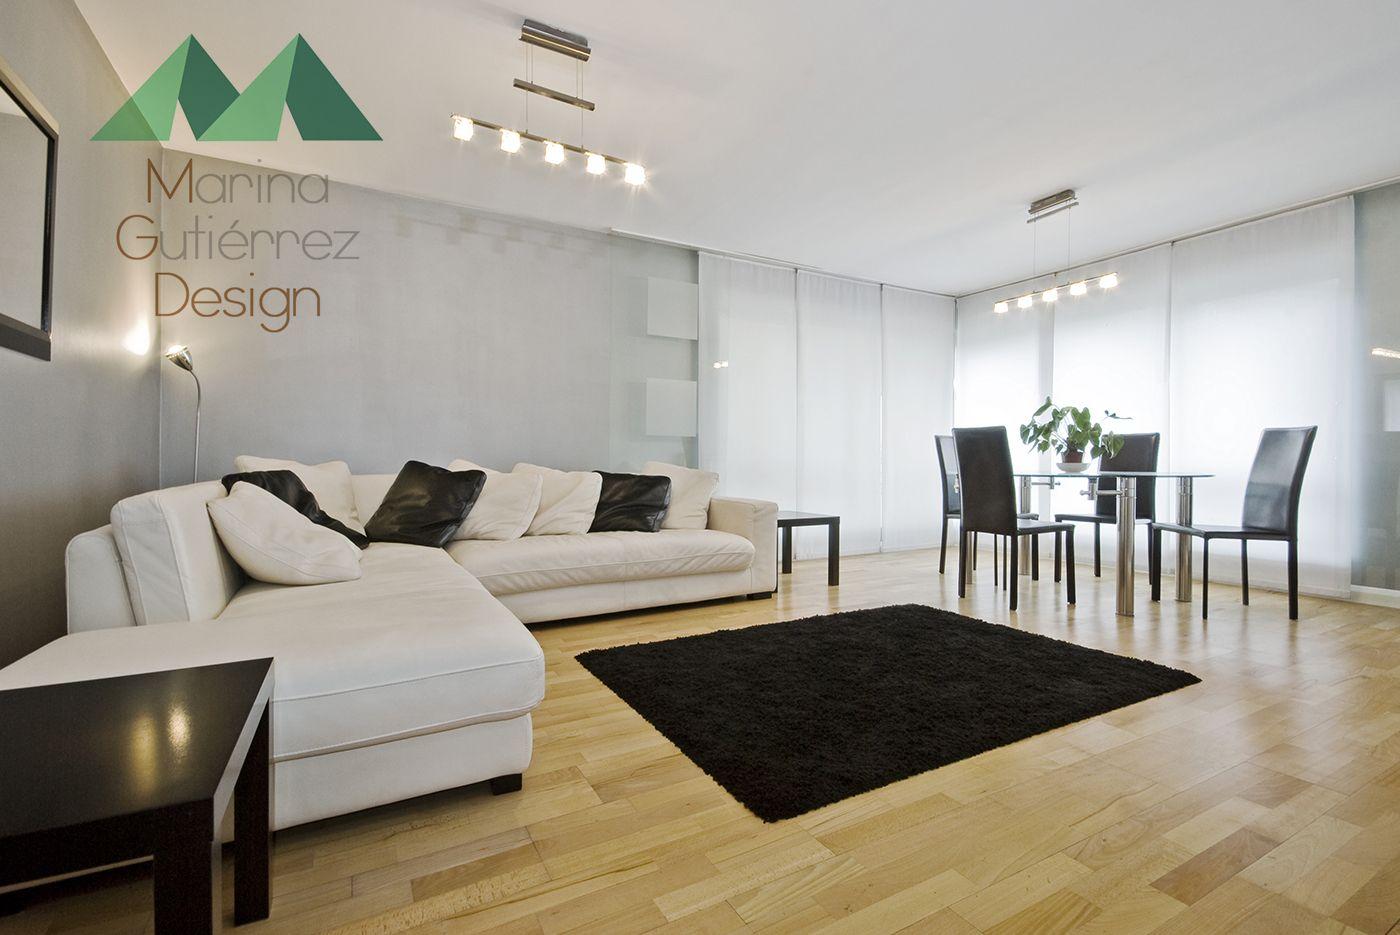 Marina Gutiérrez Design